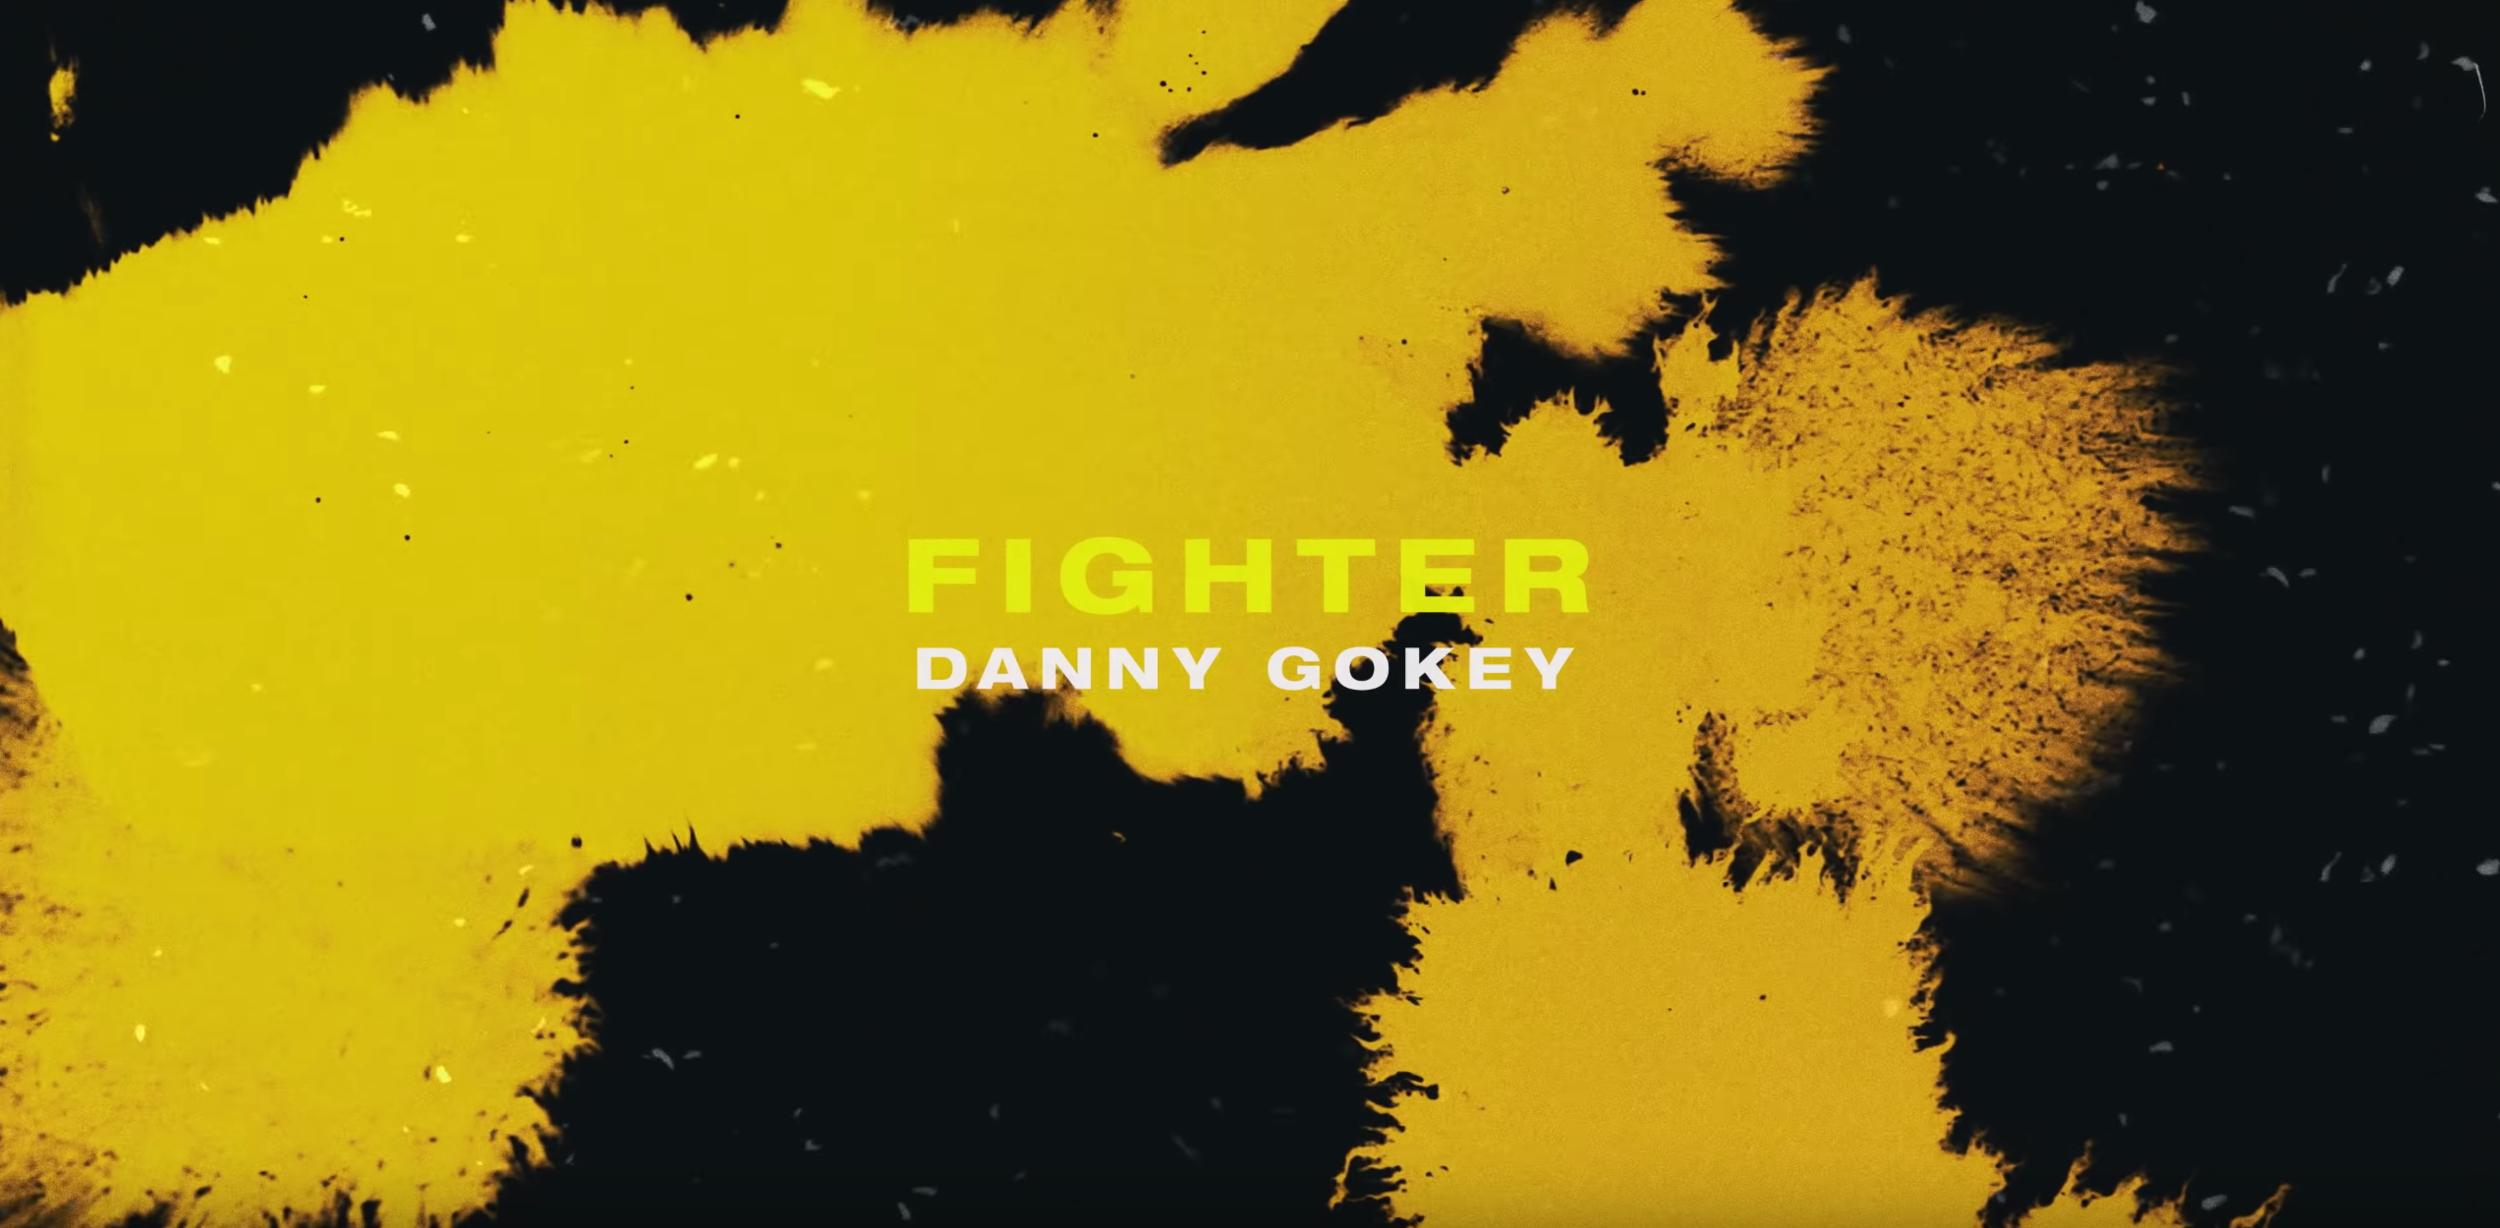 Danny Gokey // Fighter